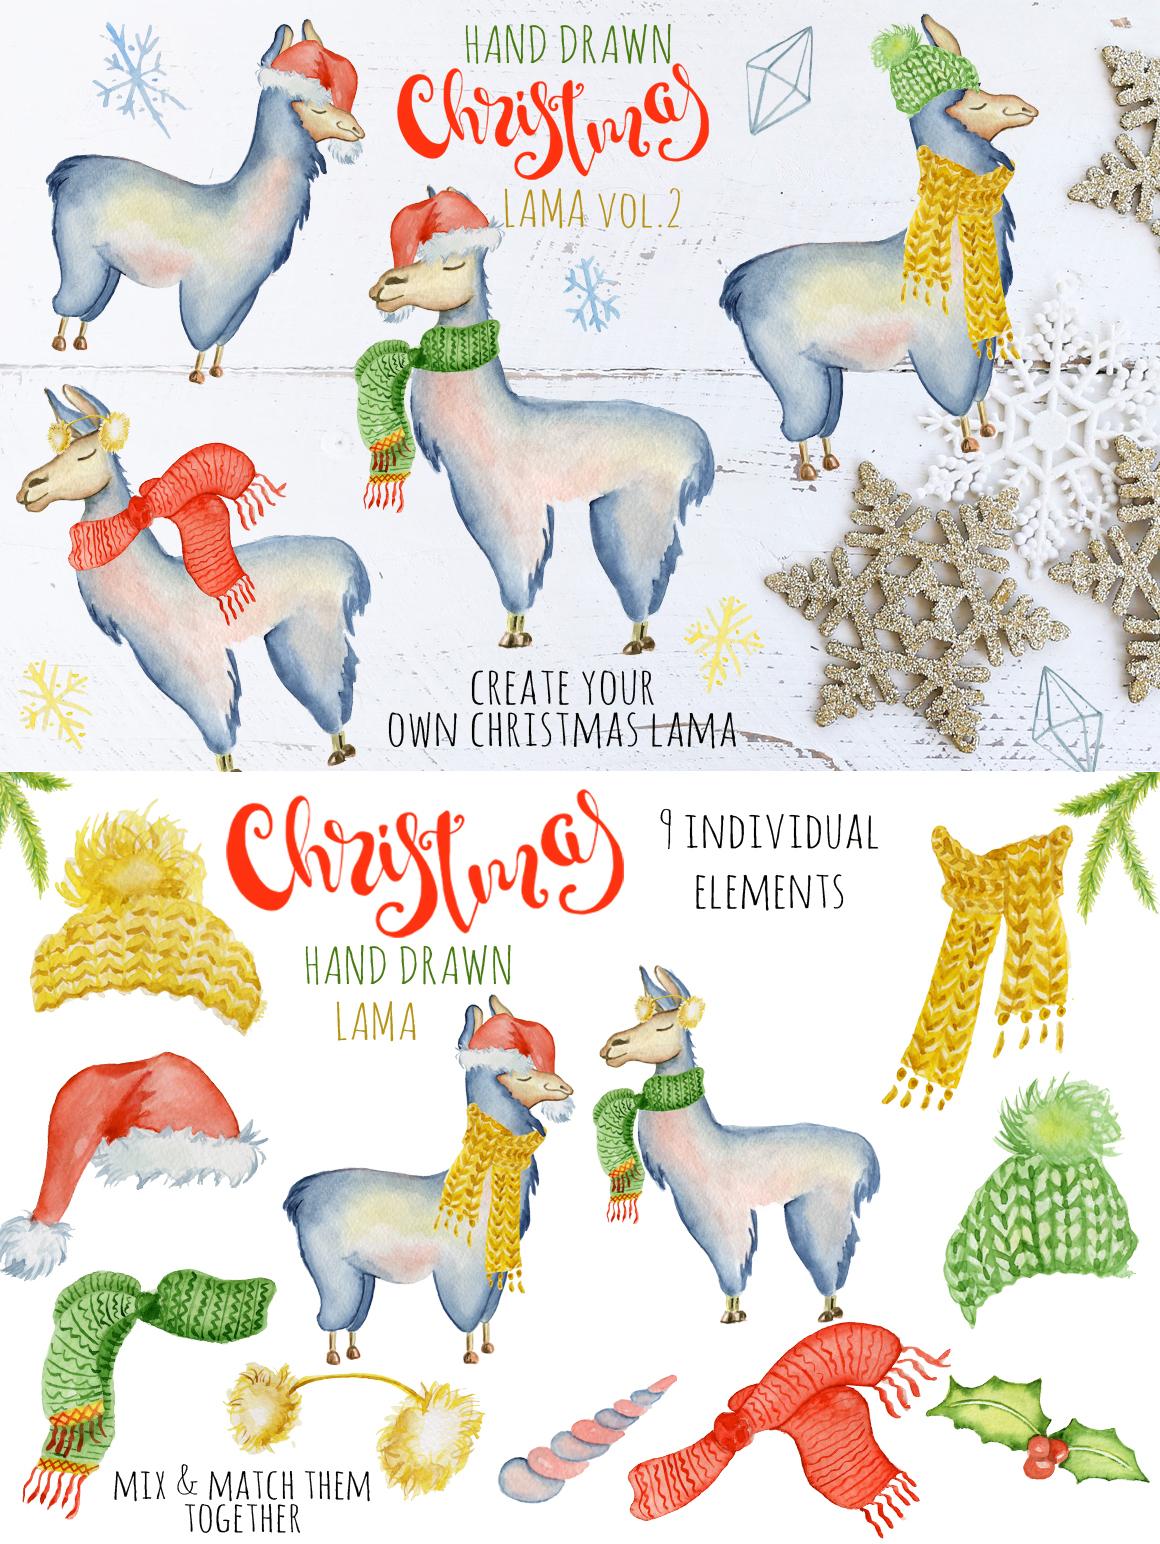 Winter Wonderland Clipart: 14 Christmas Watercolor Clipart Bundles in 1 - $28 - 10 Lama2